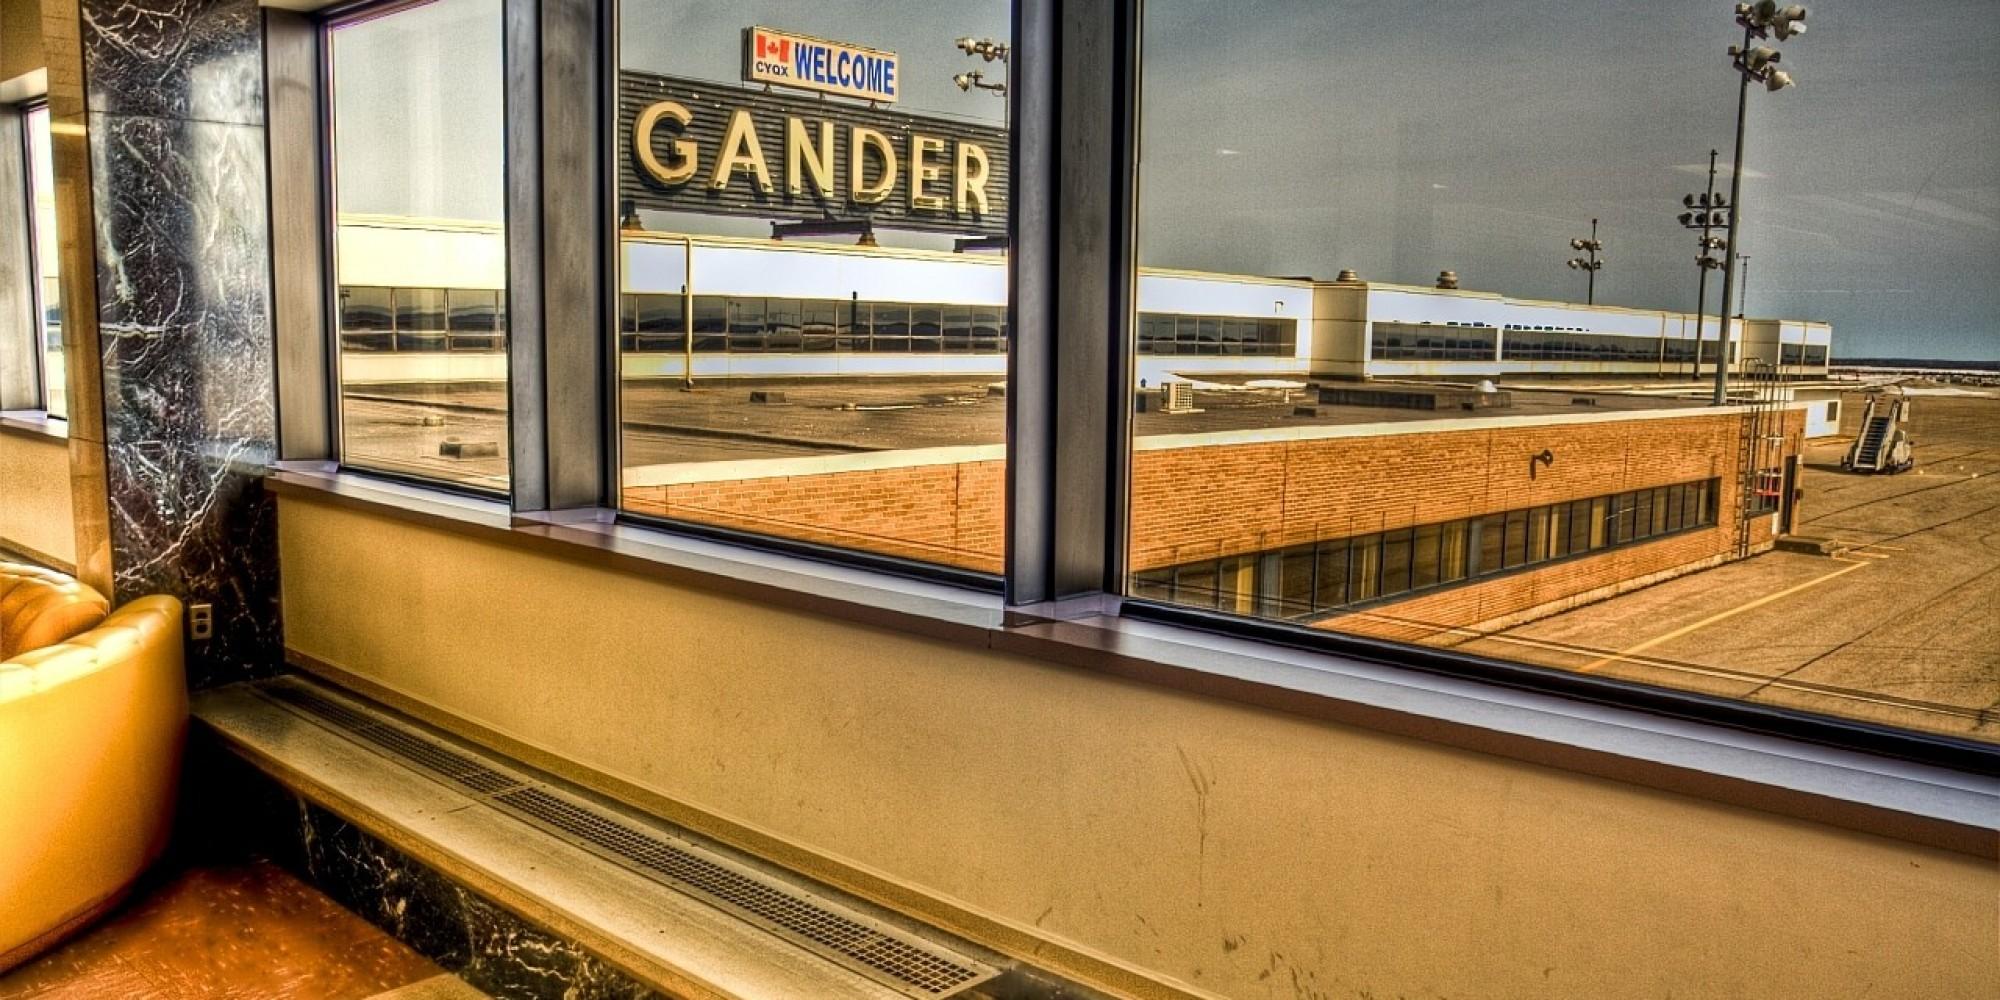 gander international airport on 39 endangered 39 list but